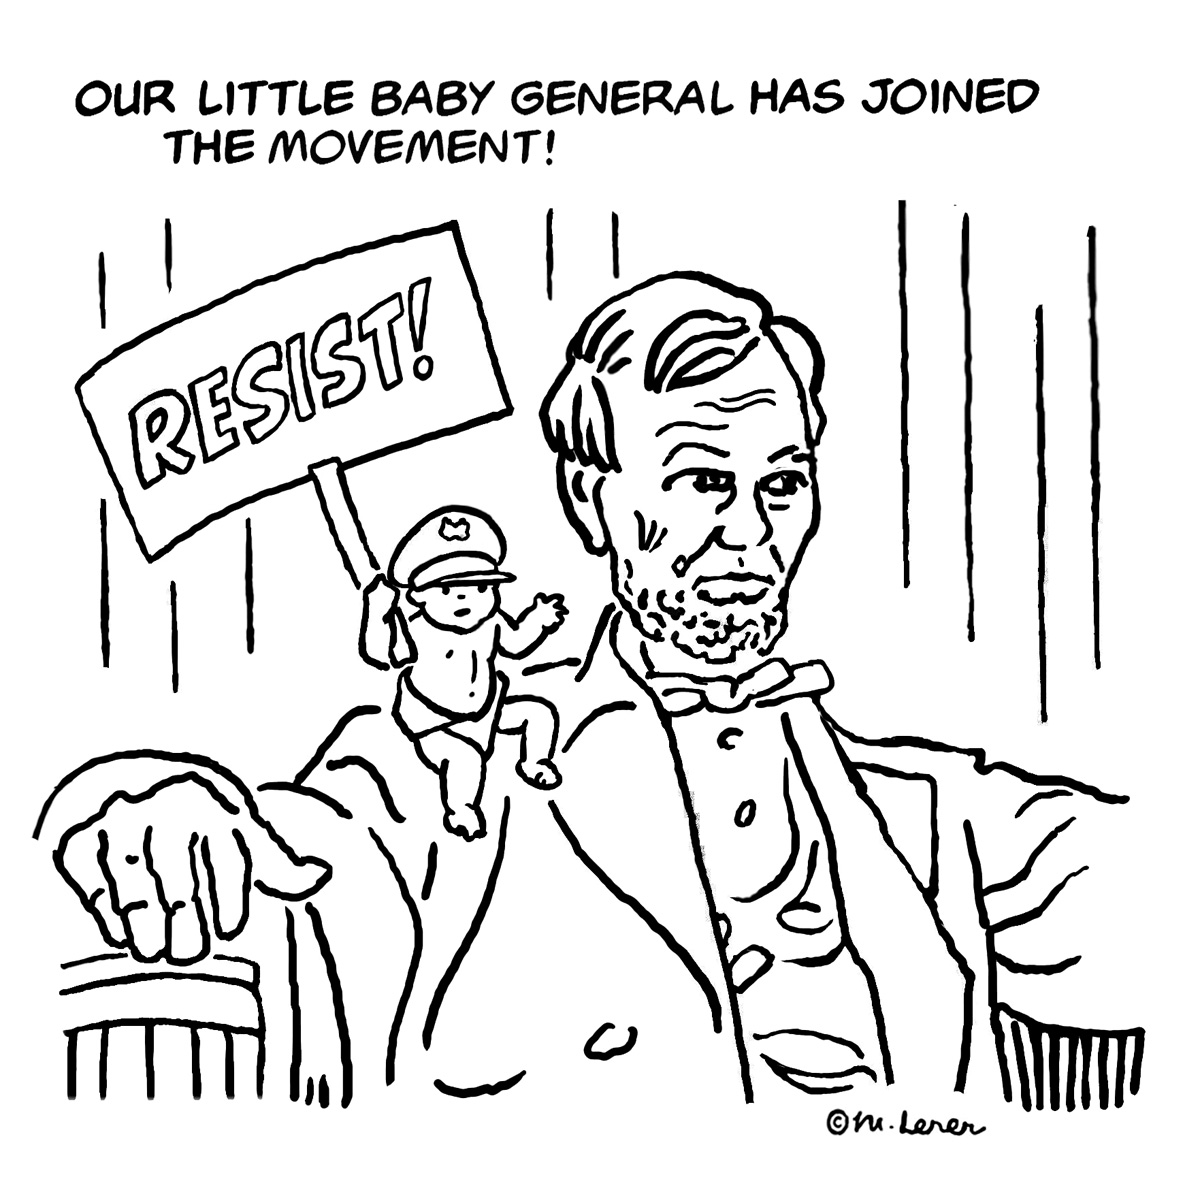 Resist - Little General by Mark Lerer